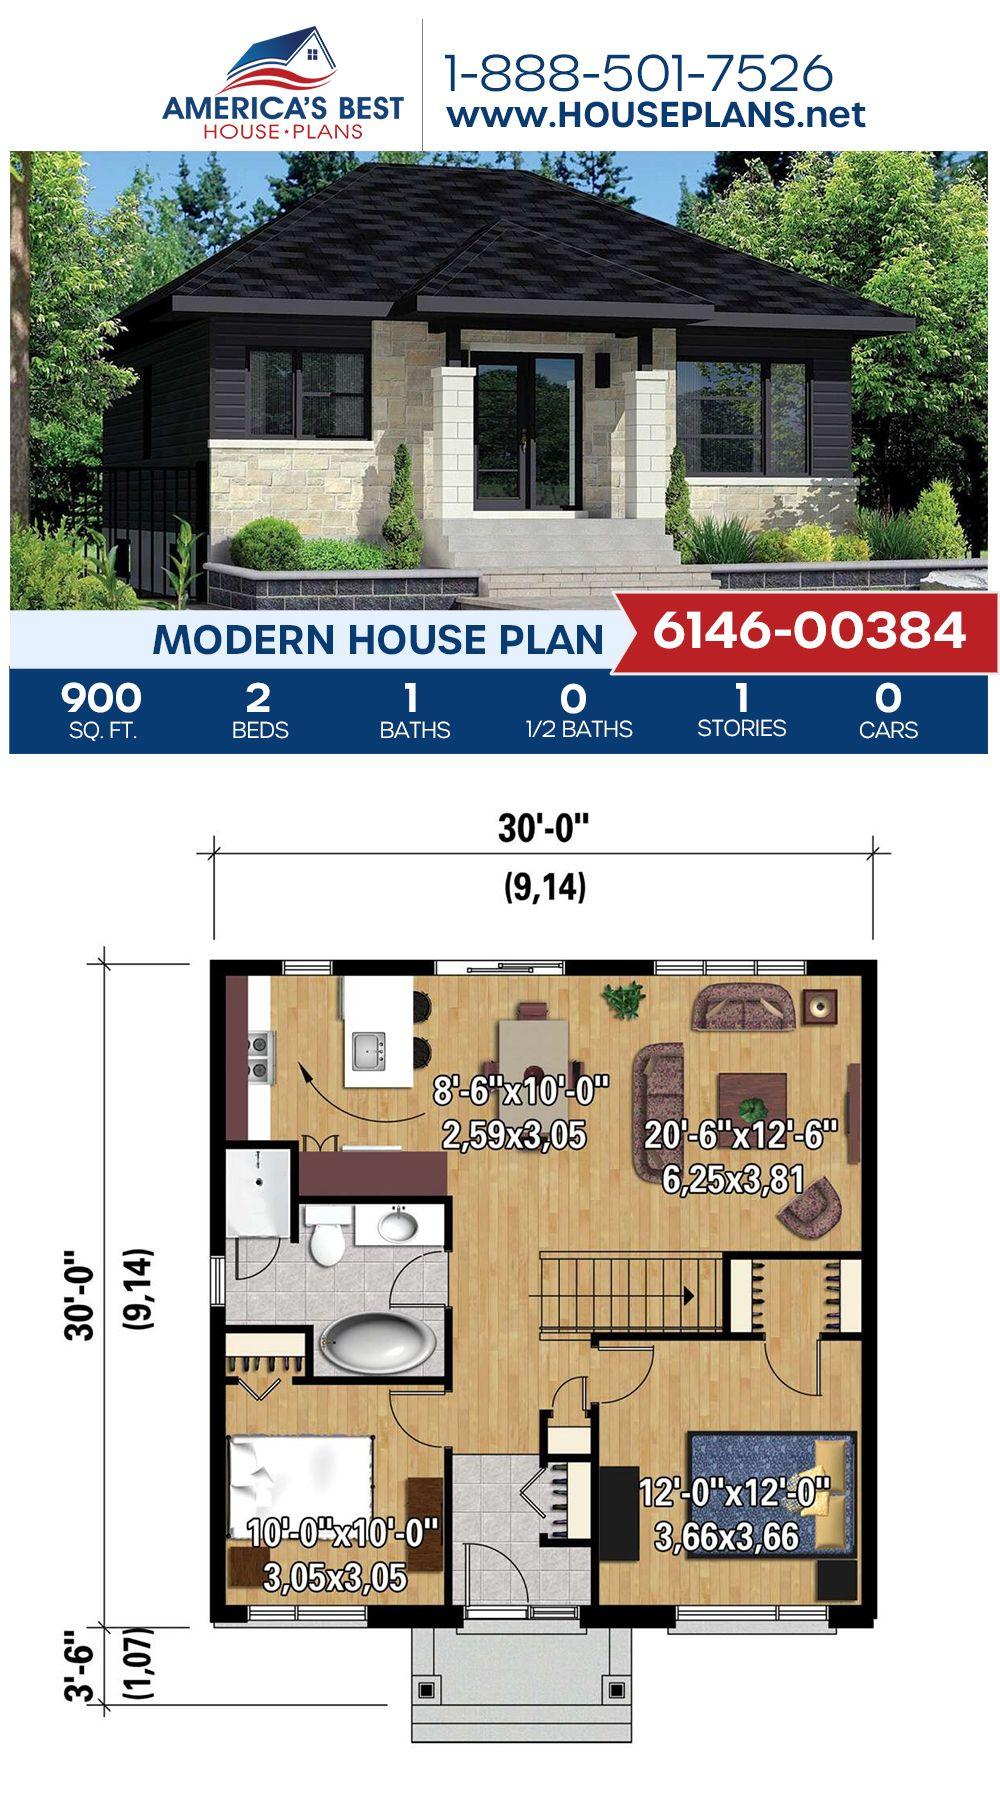 House Plan 6146-00384 - Modern Plan: 900 Square Feet, 2 ...